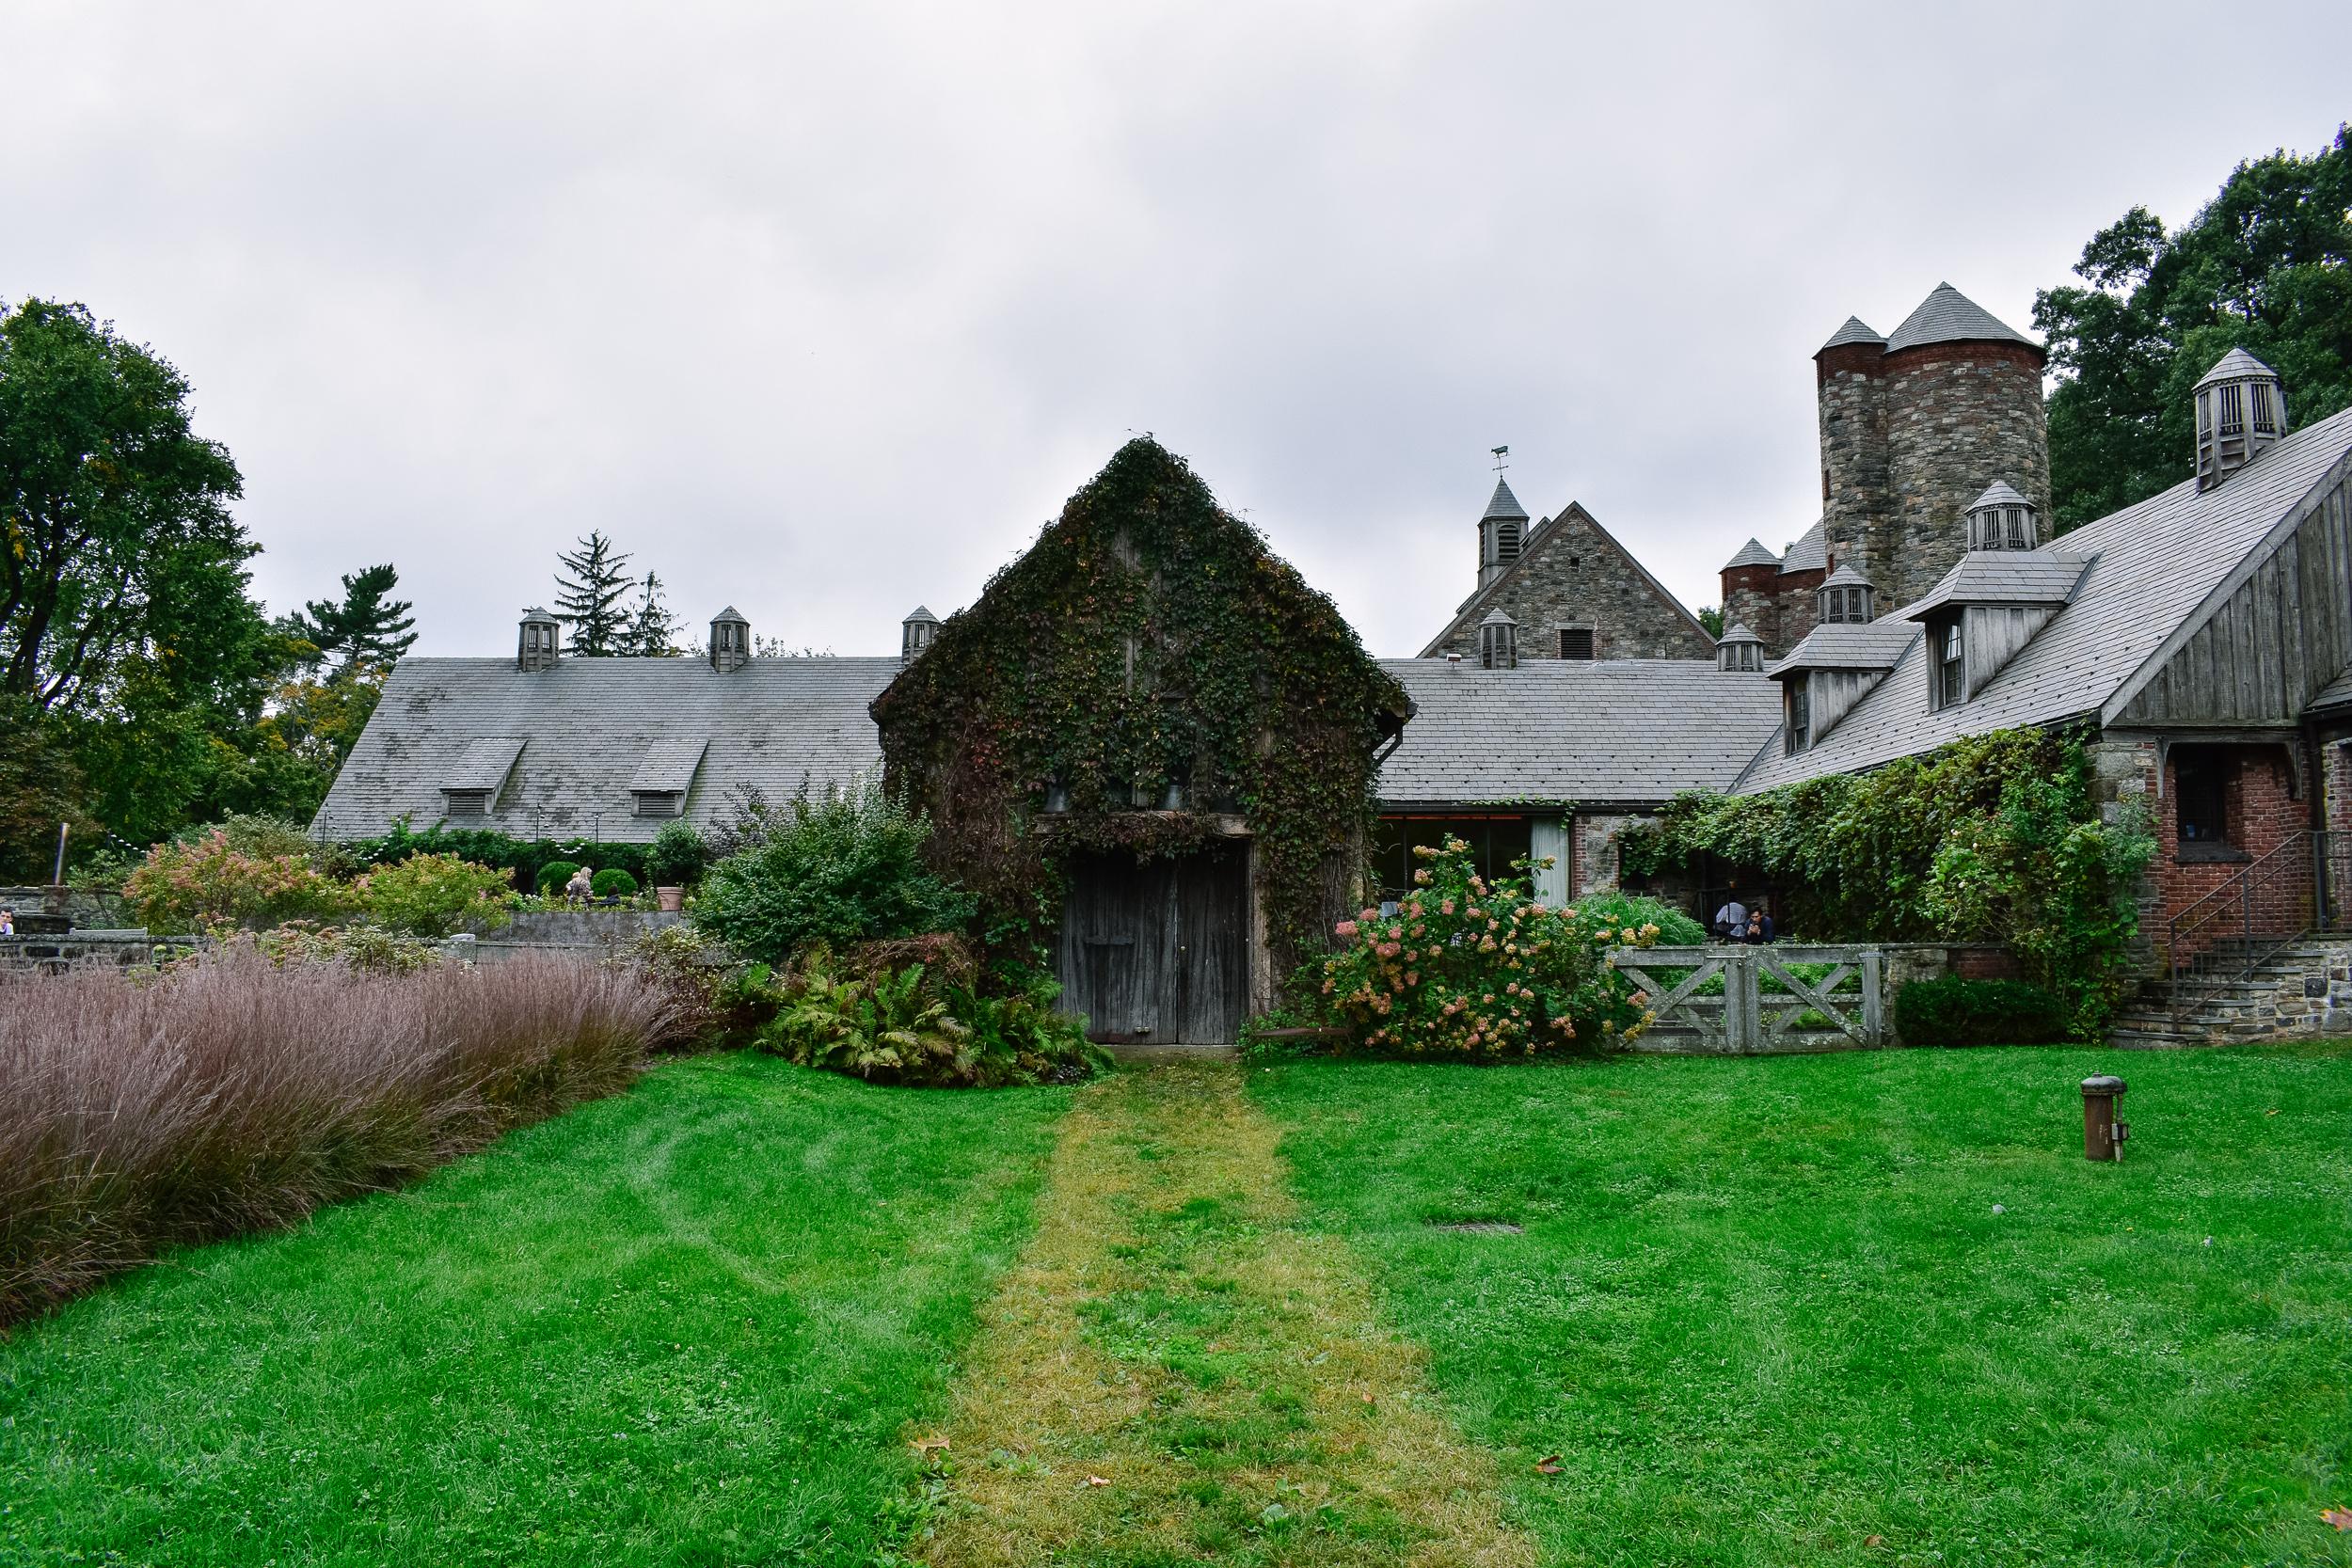 Stone Barns, a four-season farm just north of New York City